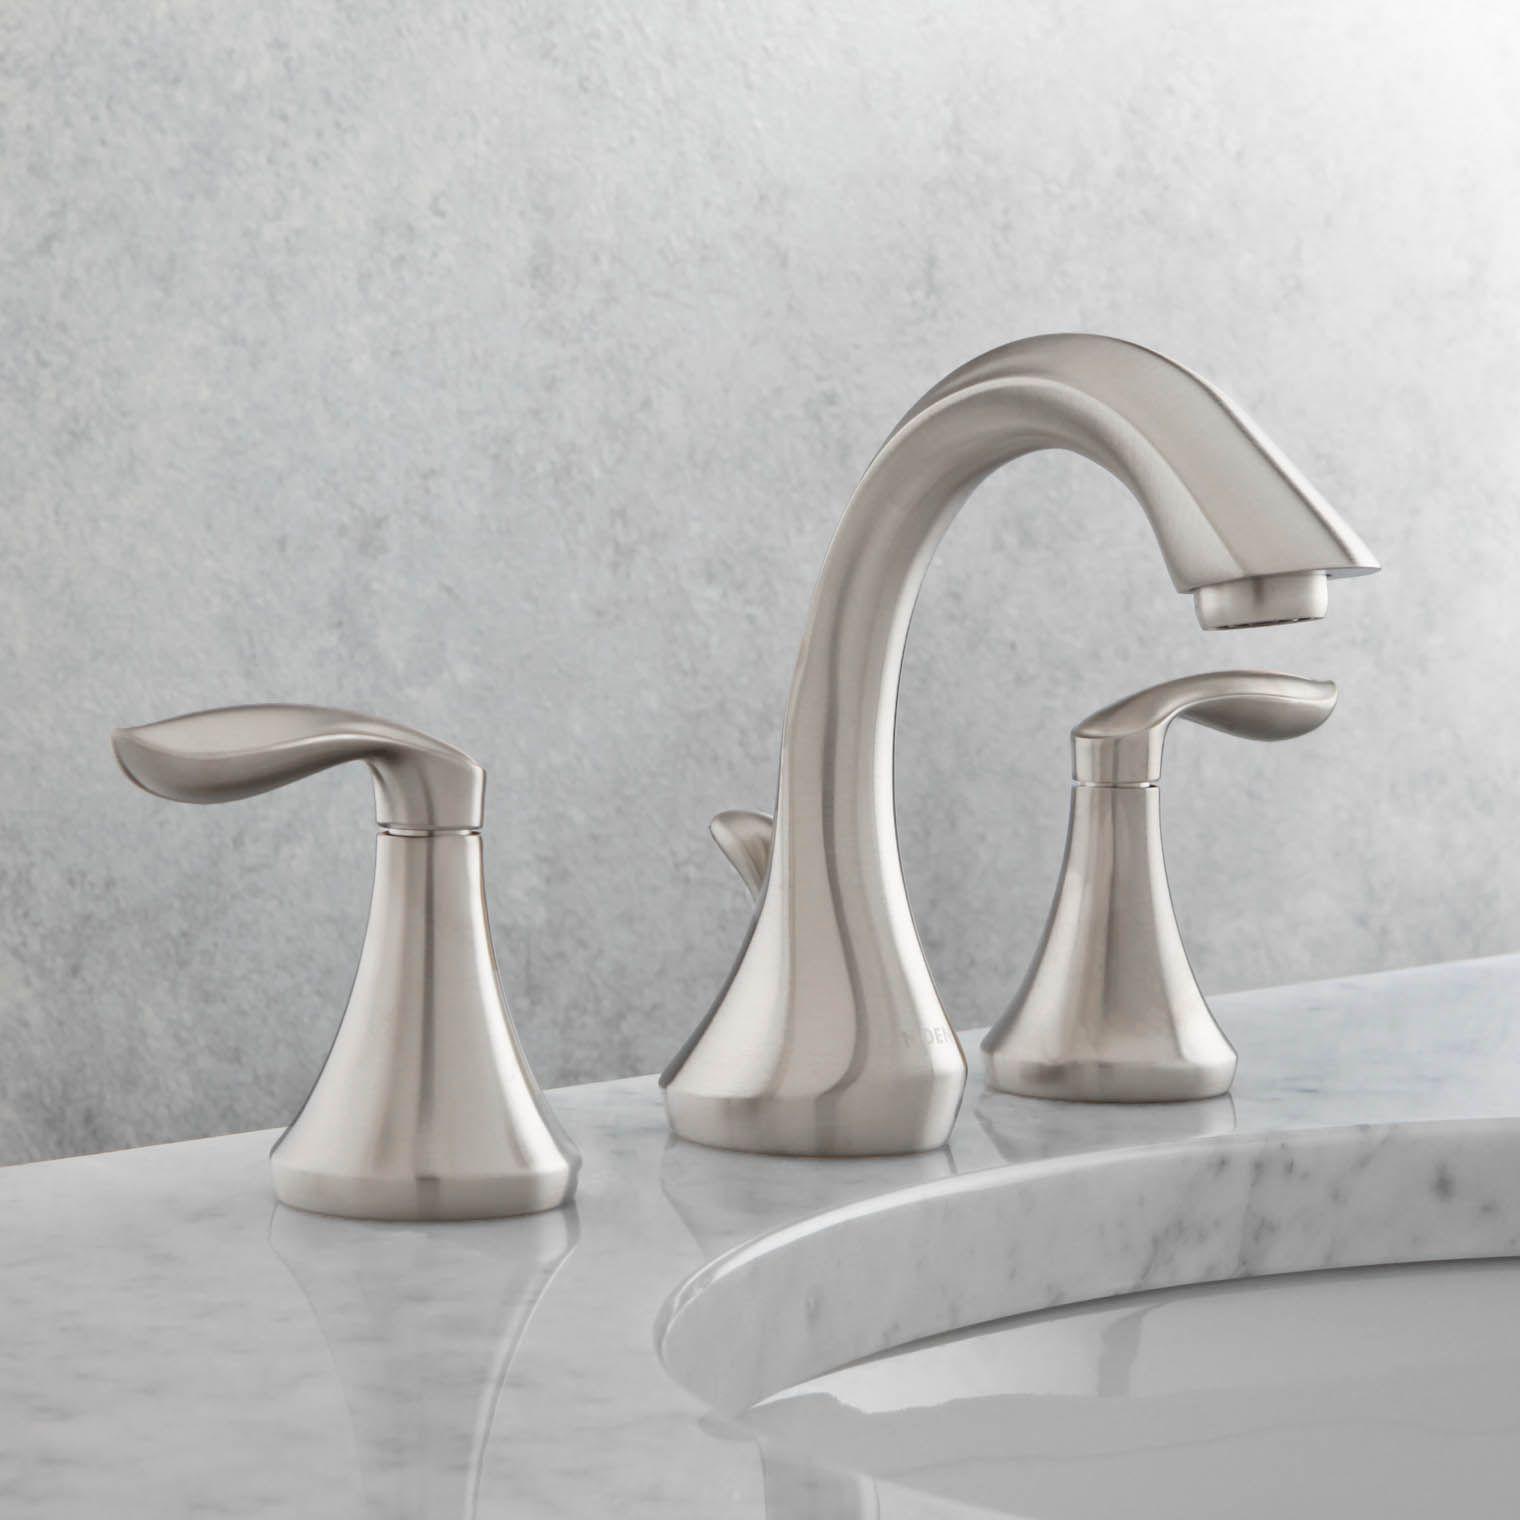 Moen T6420BN Eva Two Handle Widespread Bathroom Faucet ...